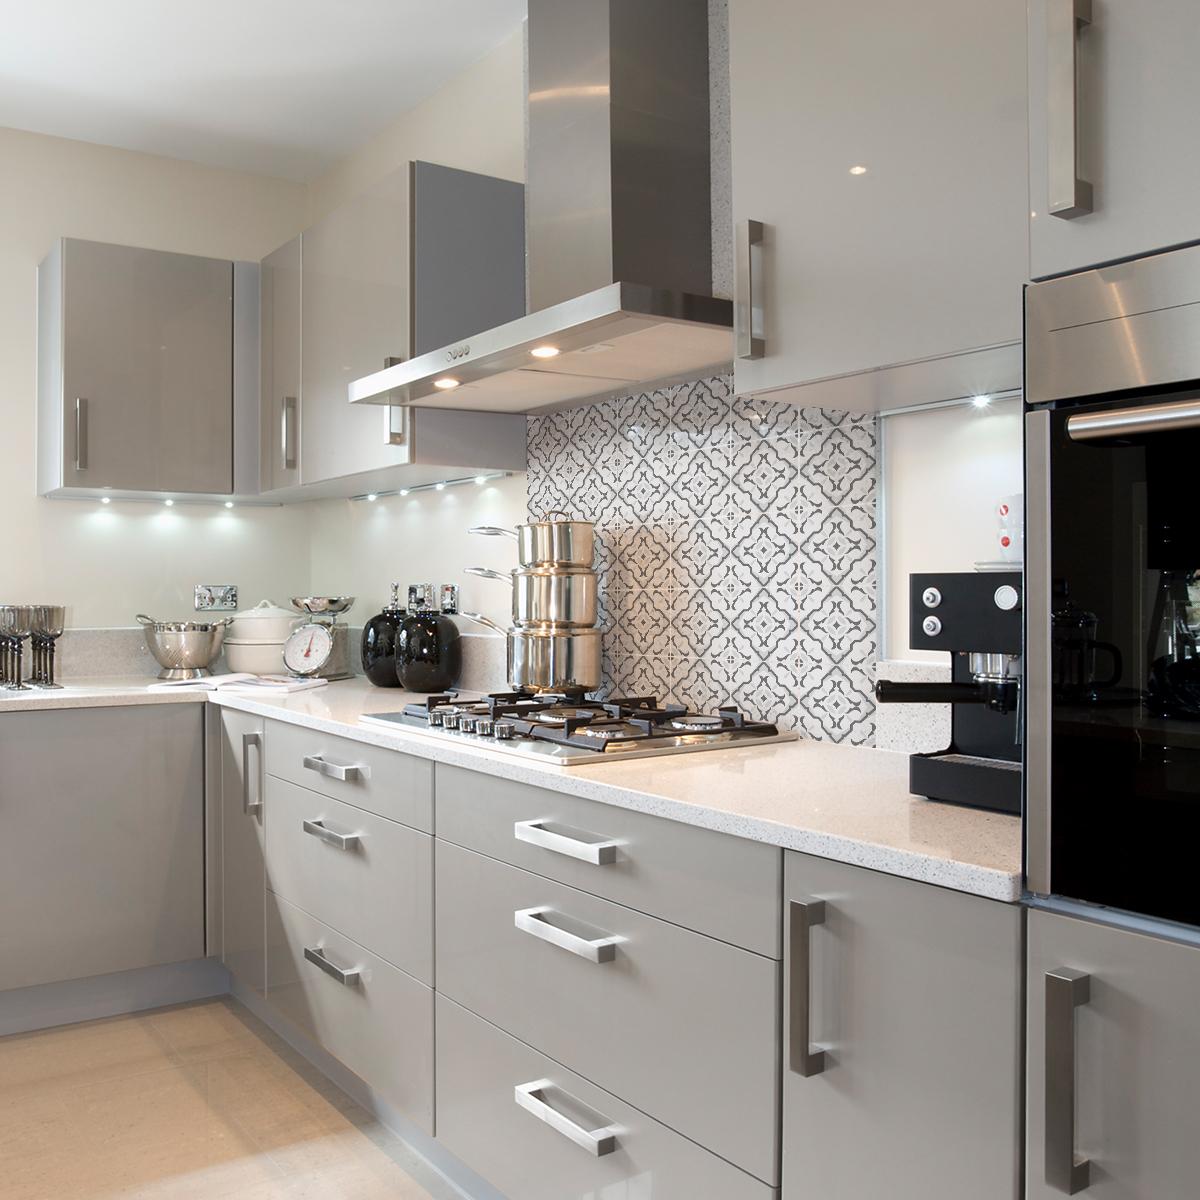 9 stickers carreaux de ciment azulejos vanda cuisine. Black Bedroom Furniture Sets. Home Design Ideas